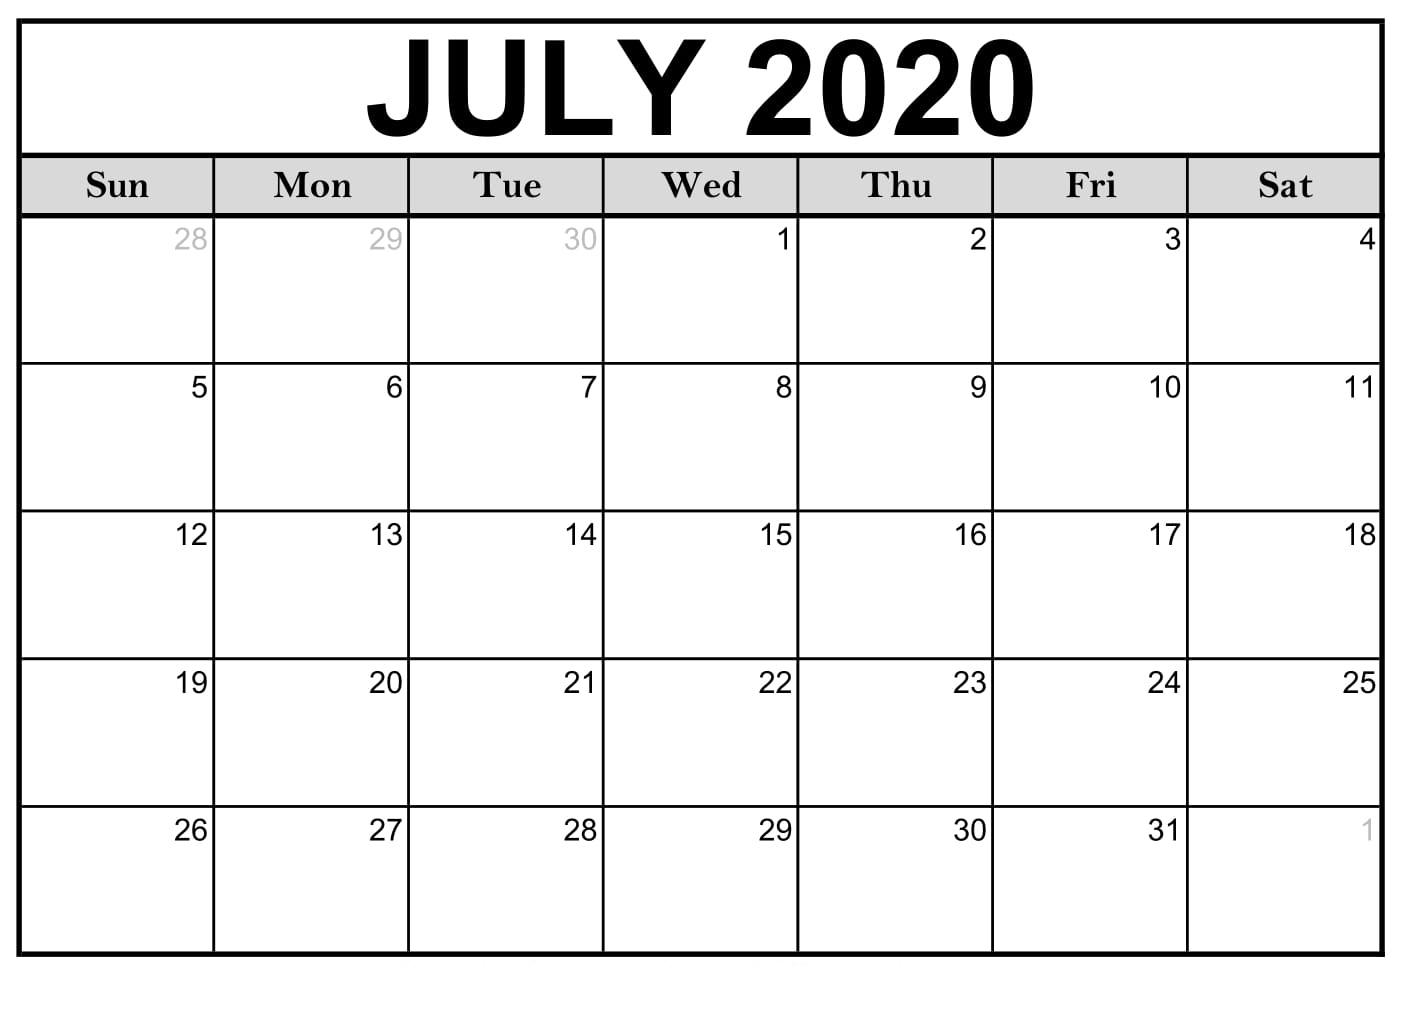 Free Printable July 2020 Calendar Template In Editable Format